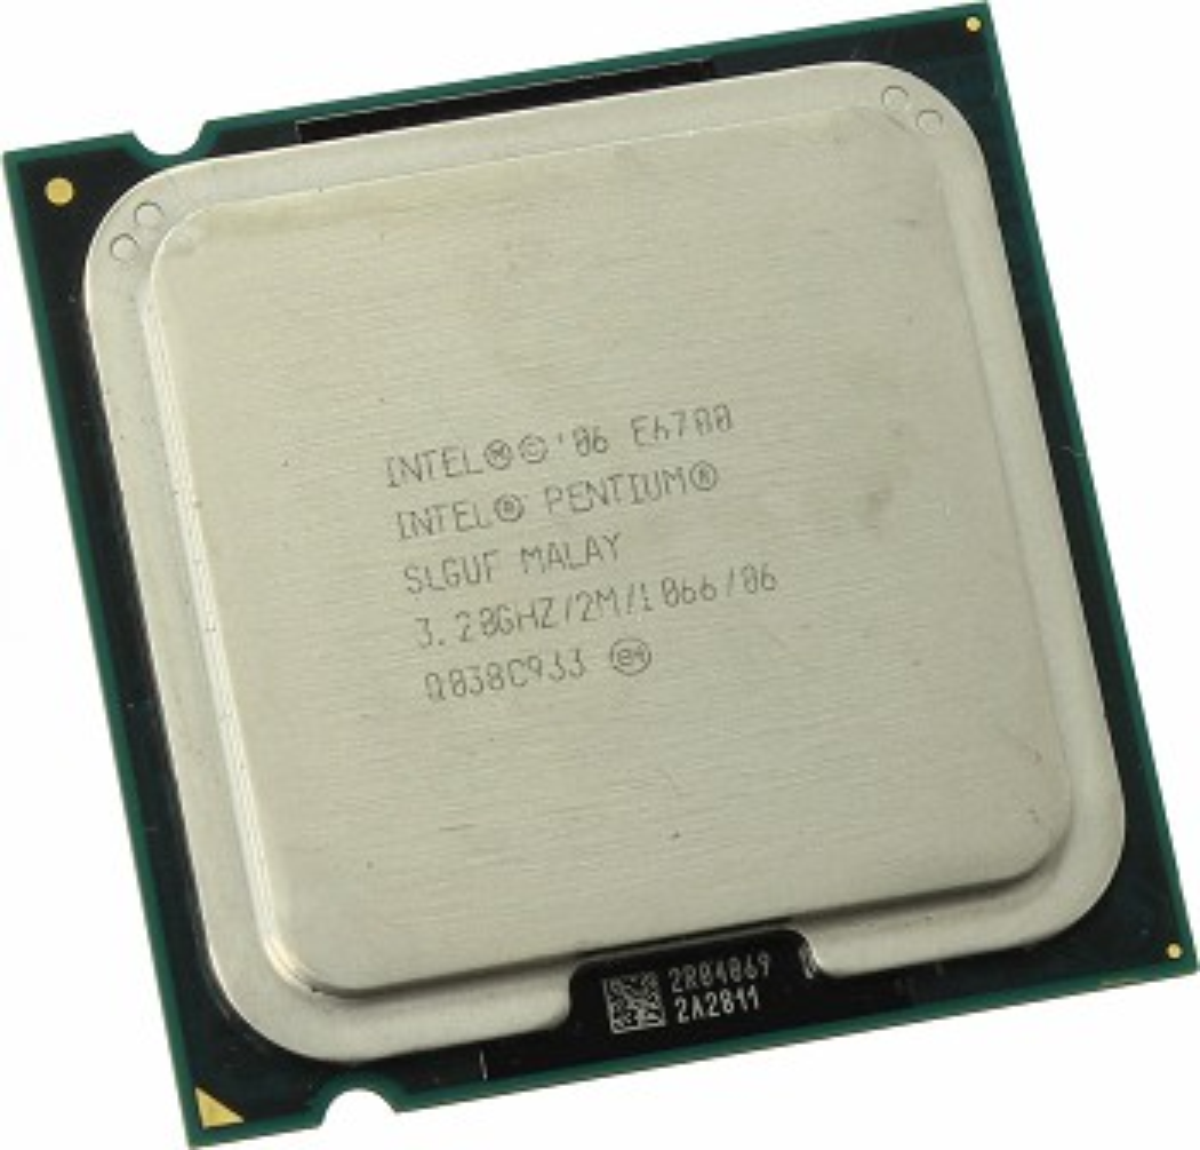 INTEL PENTIUM E6700 (2 MB ქეშ მეხსიერება, 3.2 GHZ) TRAY